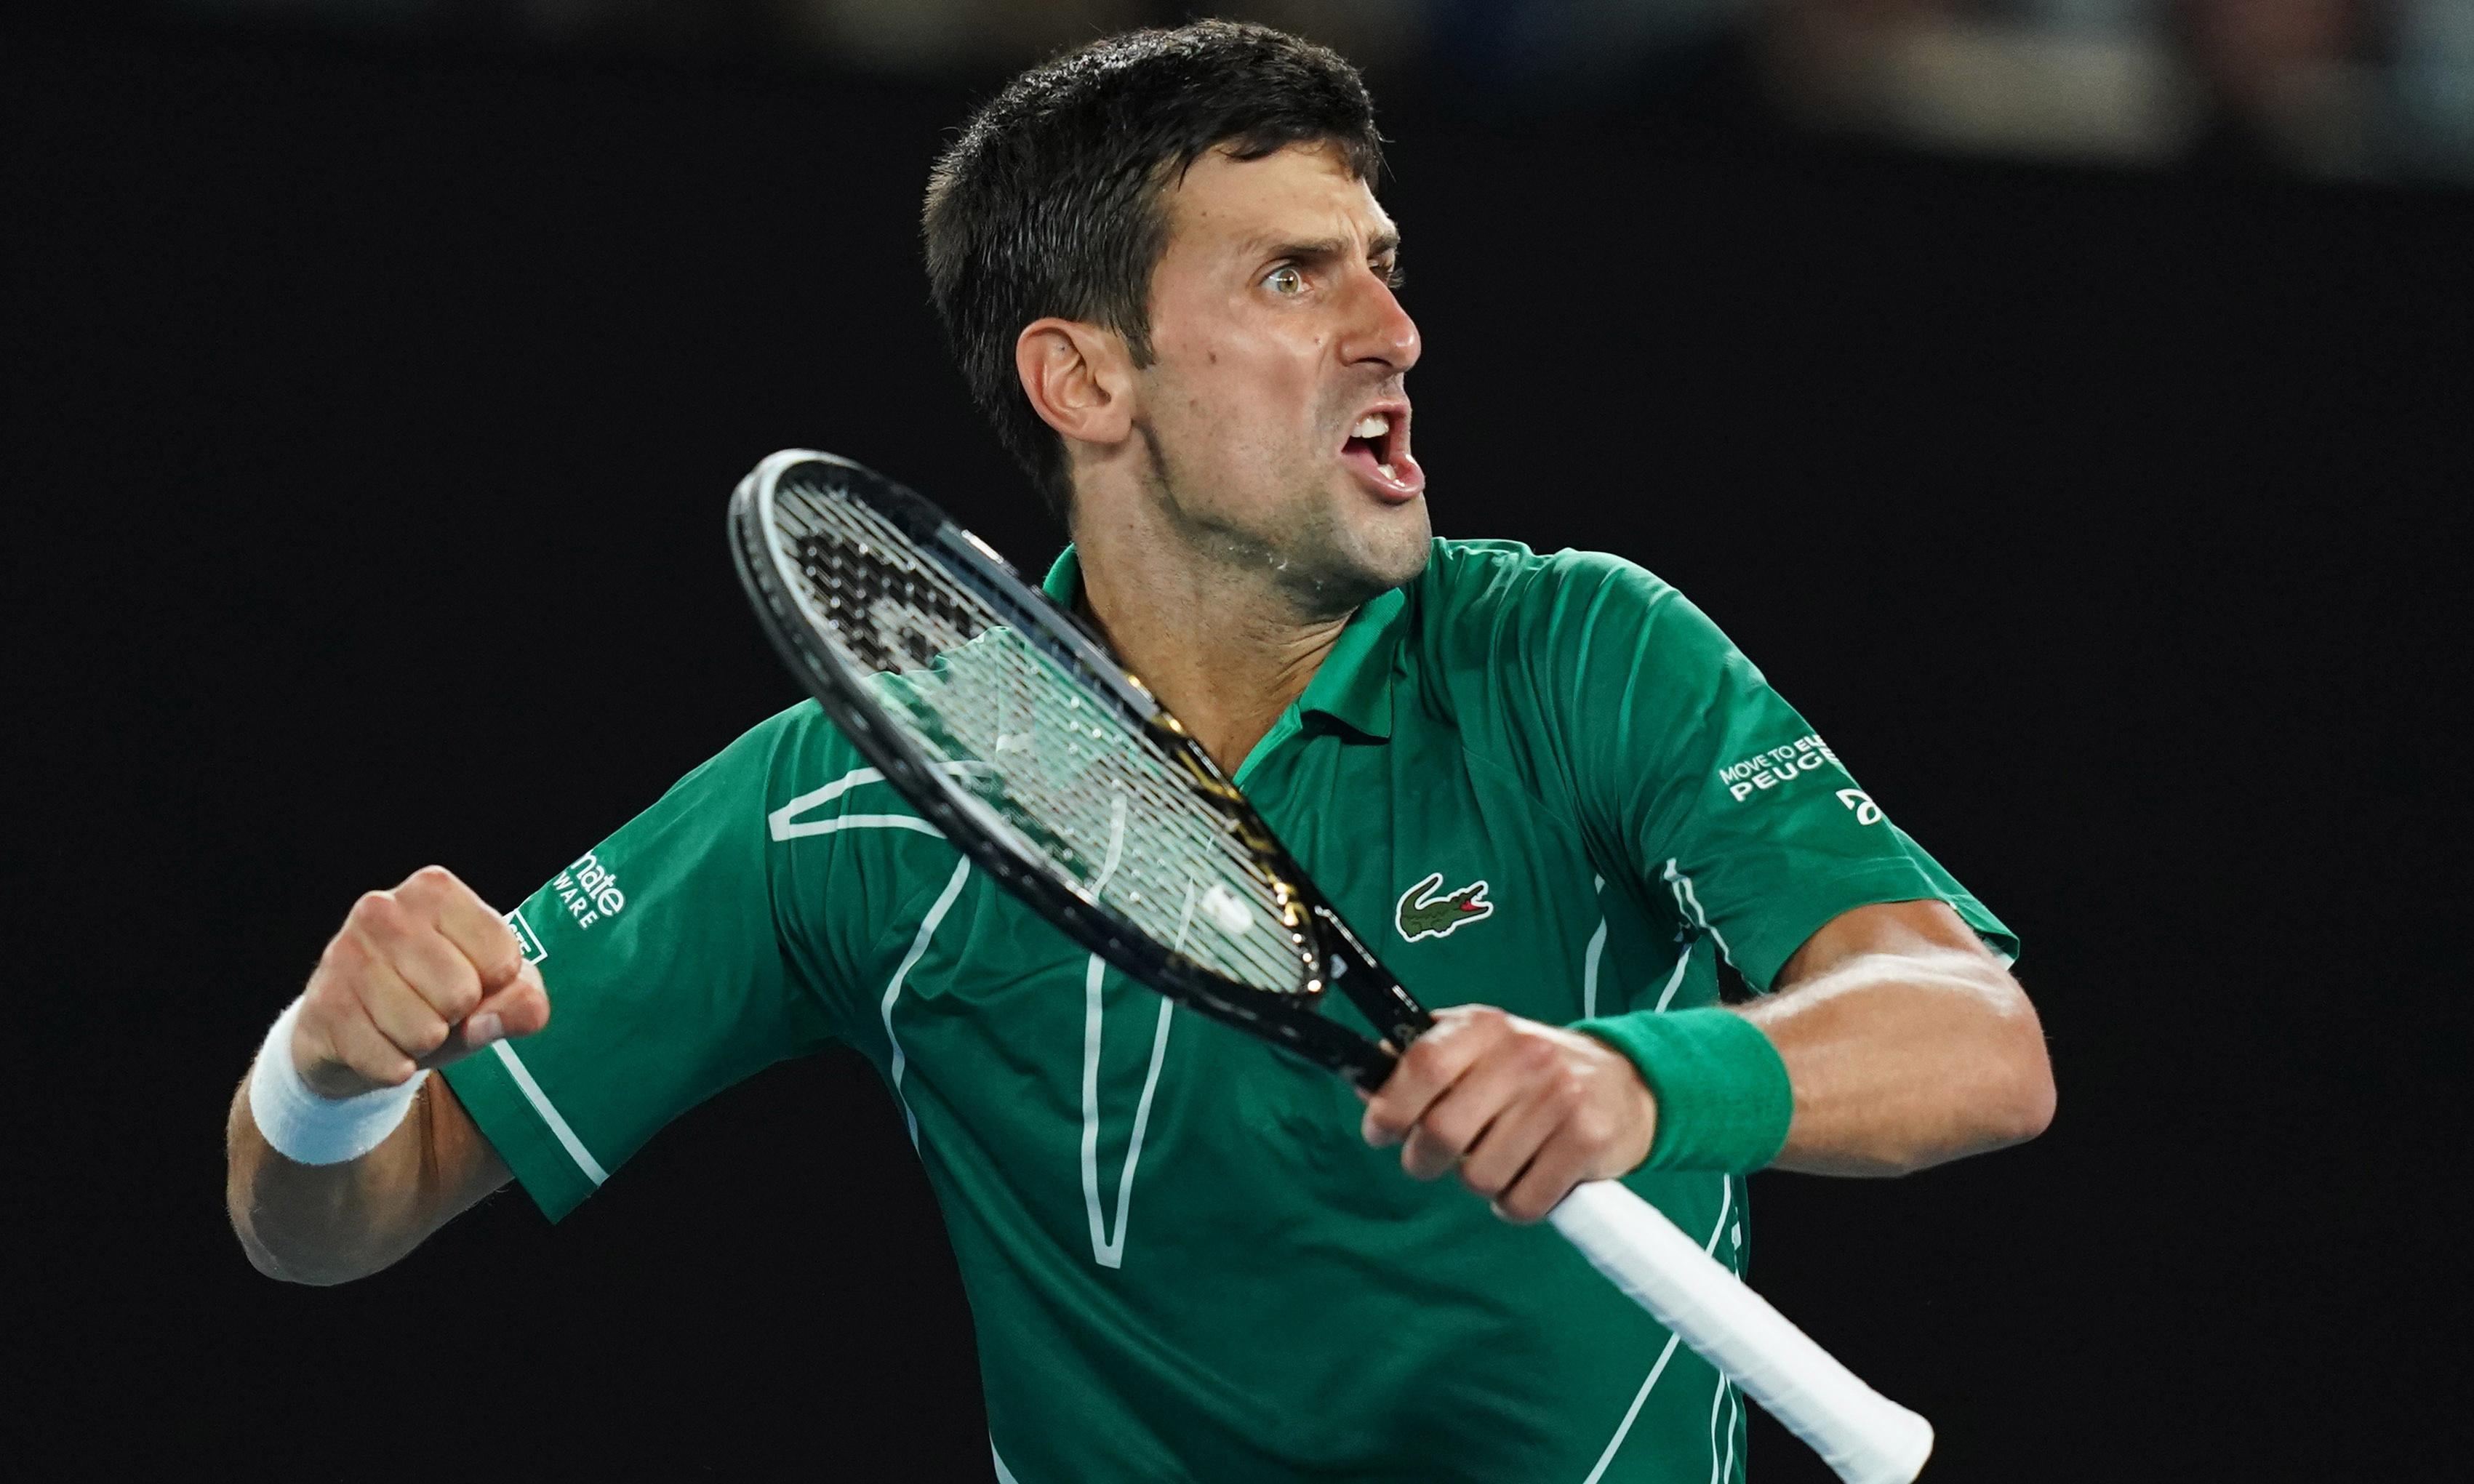 Djokovic eases past Federer in straight sets to make Australian Open final